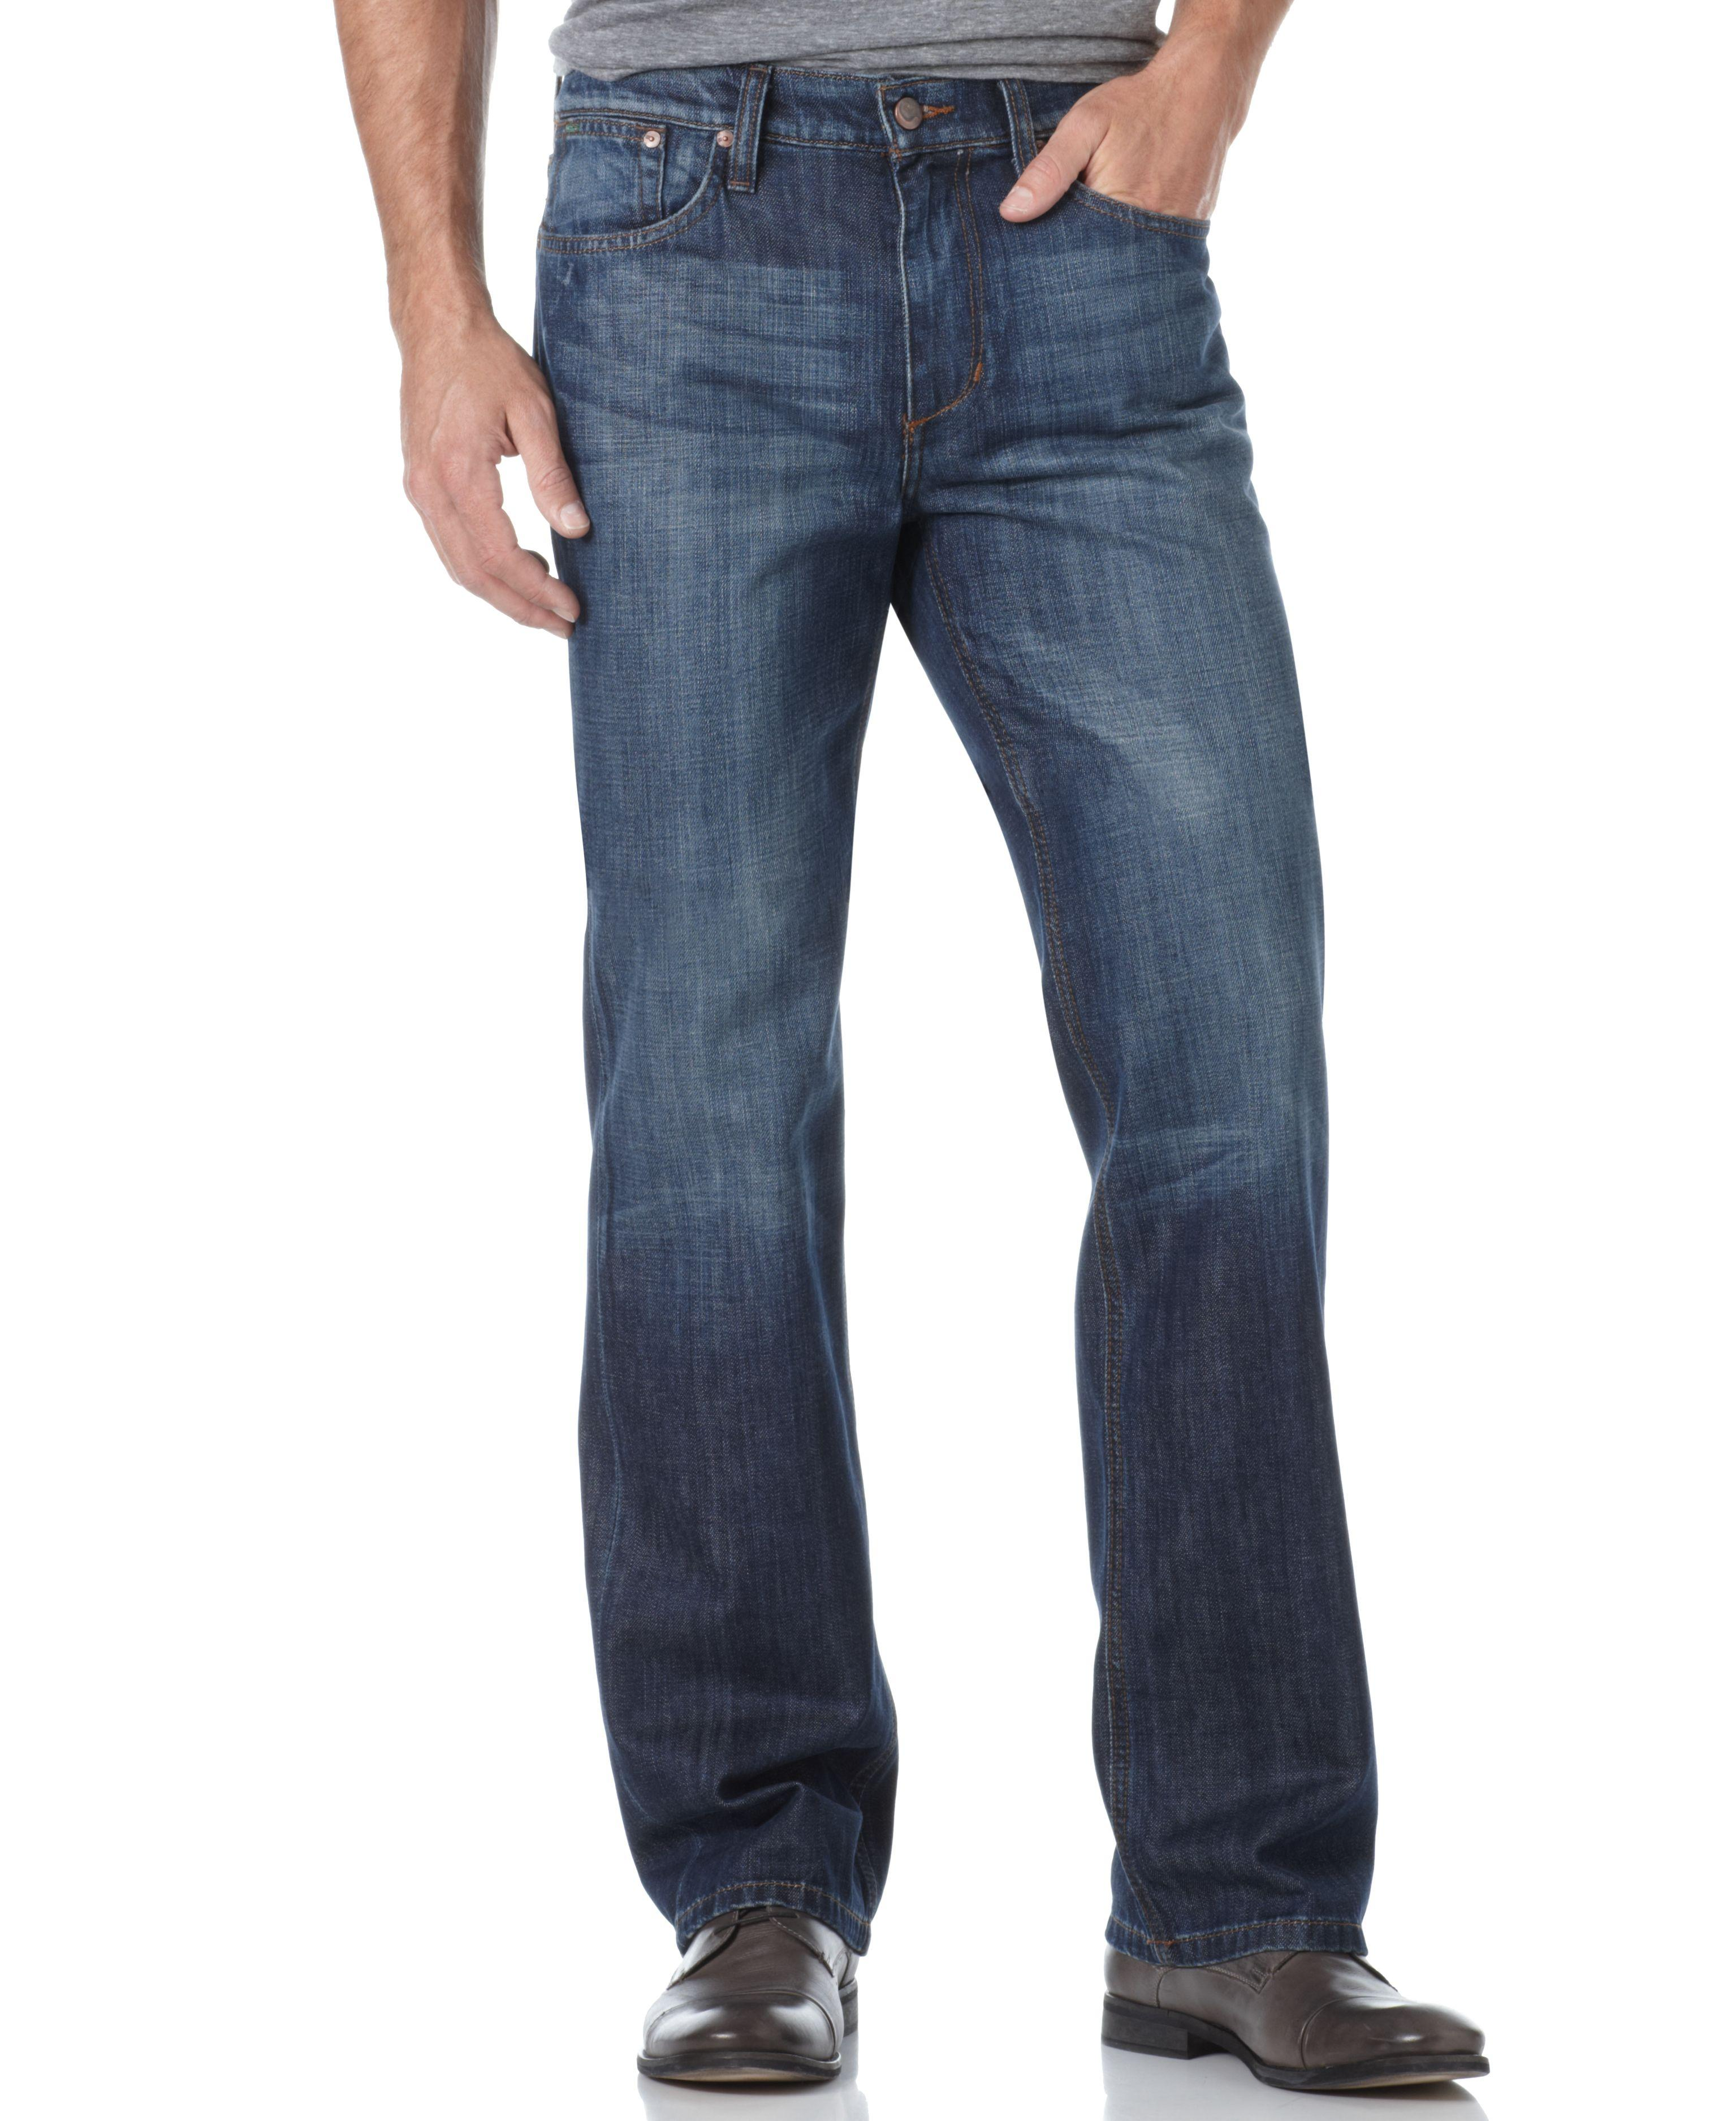 Dockers Men's Big & Tall Classic Fit Jean Cut Khaki Pants D3. Sold by Sears + 1. $ $ - $ Dockers Men's Easy Khaki Classic Fit Pants D3 (4) Sold by Sears. $ Dockers Men's Big & Tall Classic Fit Easy Khaki Pants. Sold by Sears. $ $ Dockers D3 Mens Twill Classic Fit .